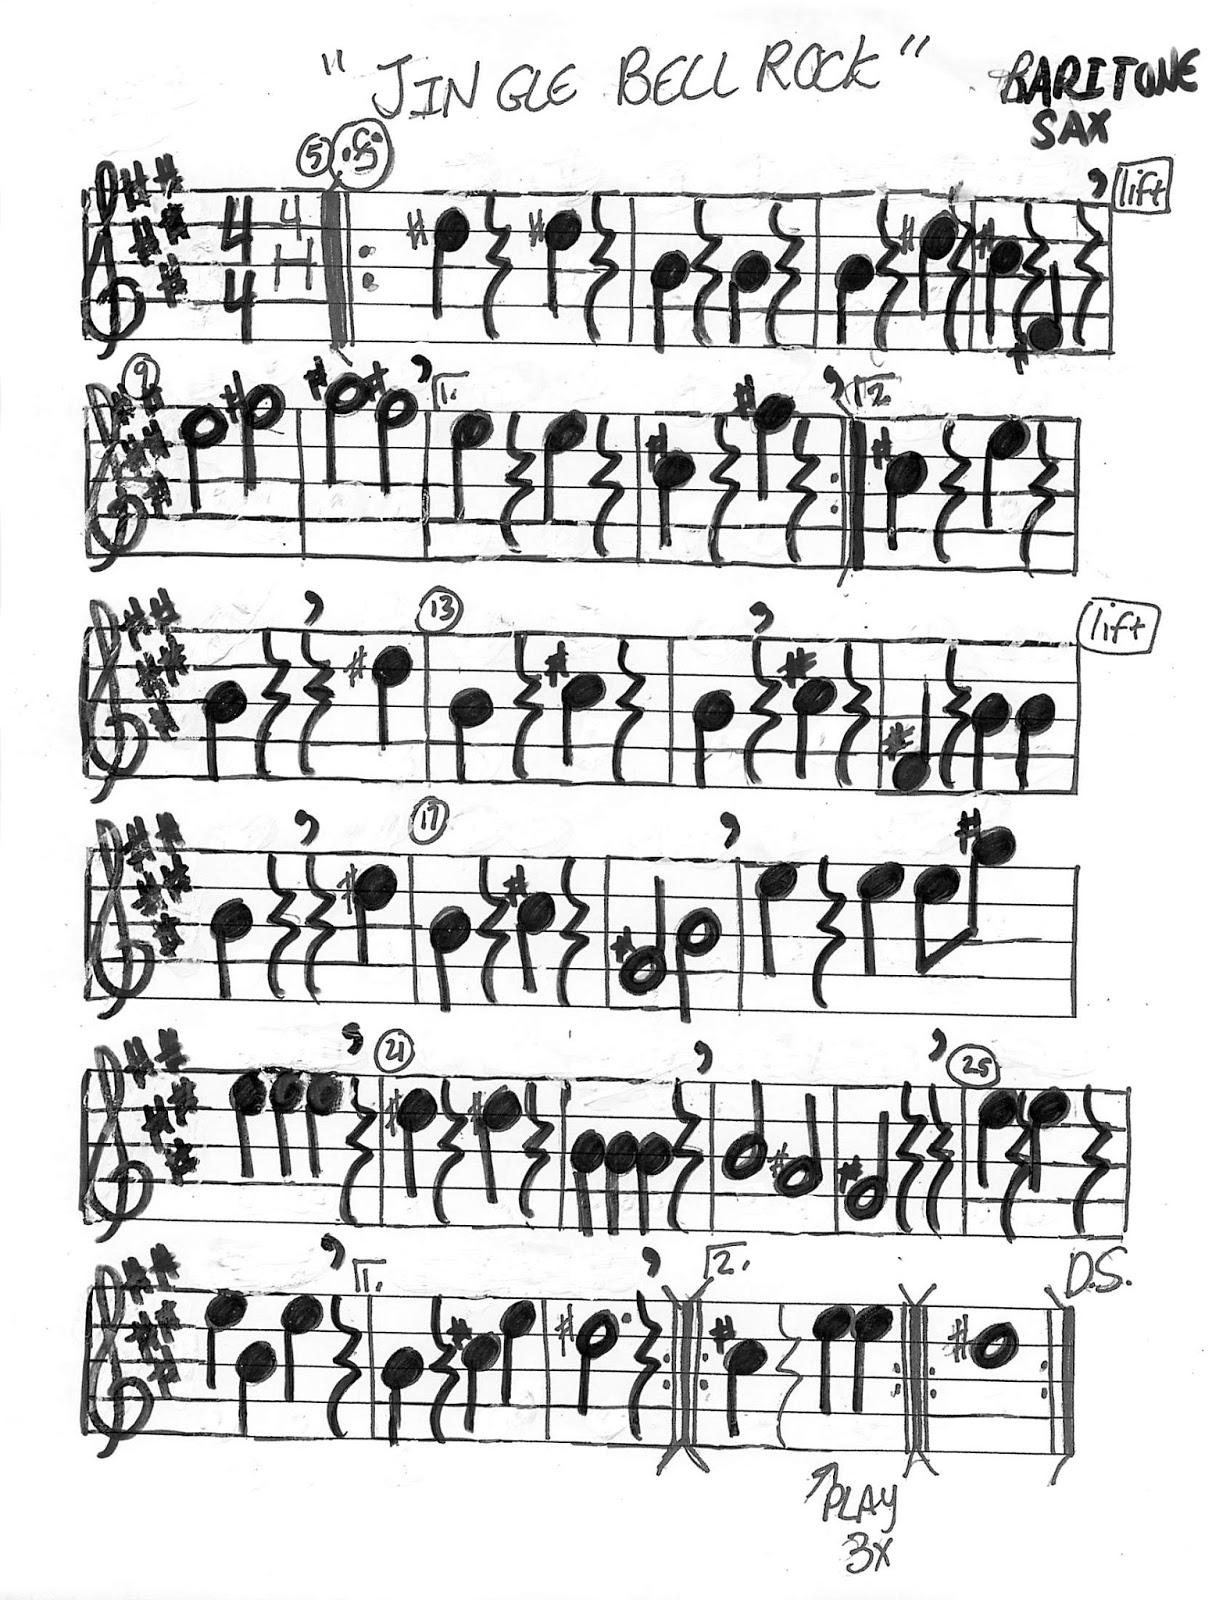 Jingle Bell Rock Chart